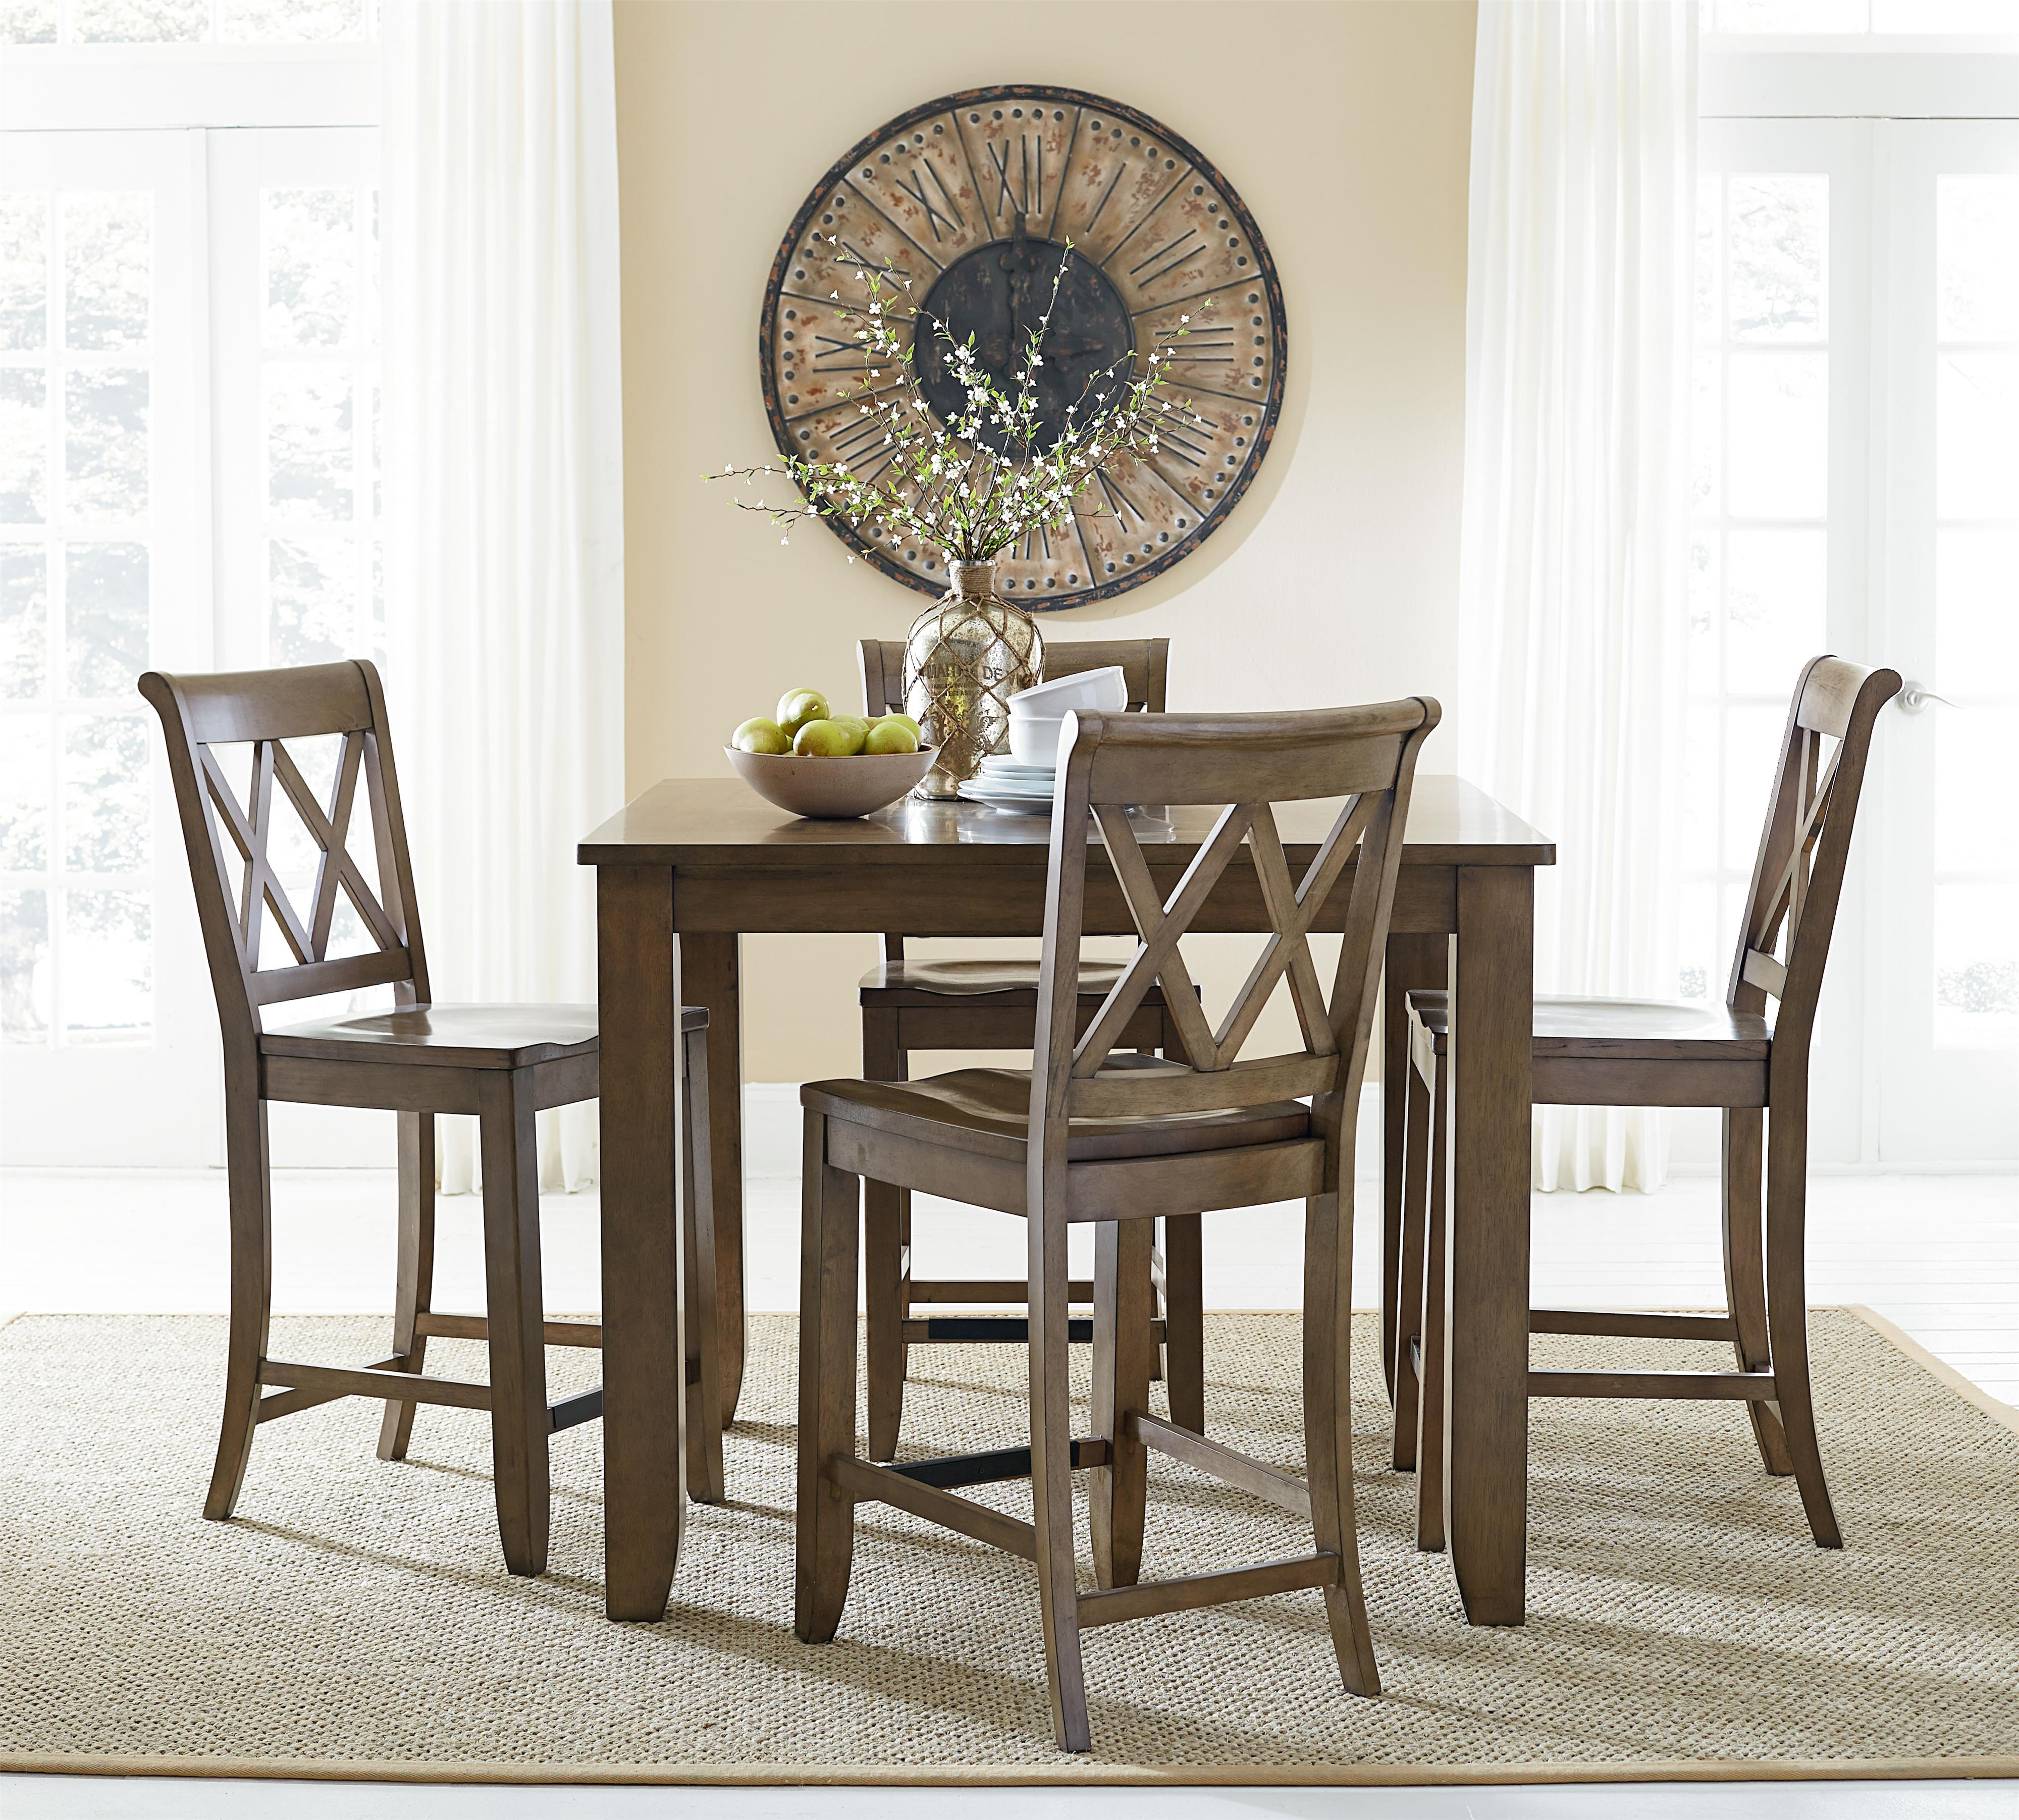 Standard Furniture Vintage Counter Height Dining Set - Item Number: 11326+4x27